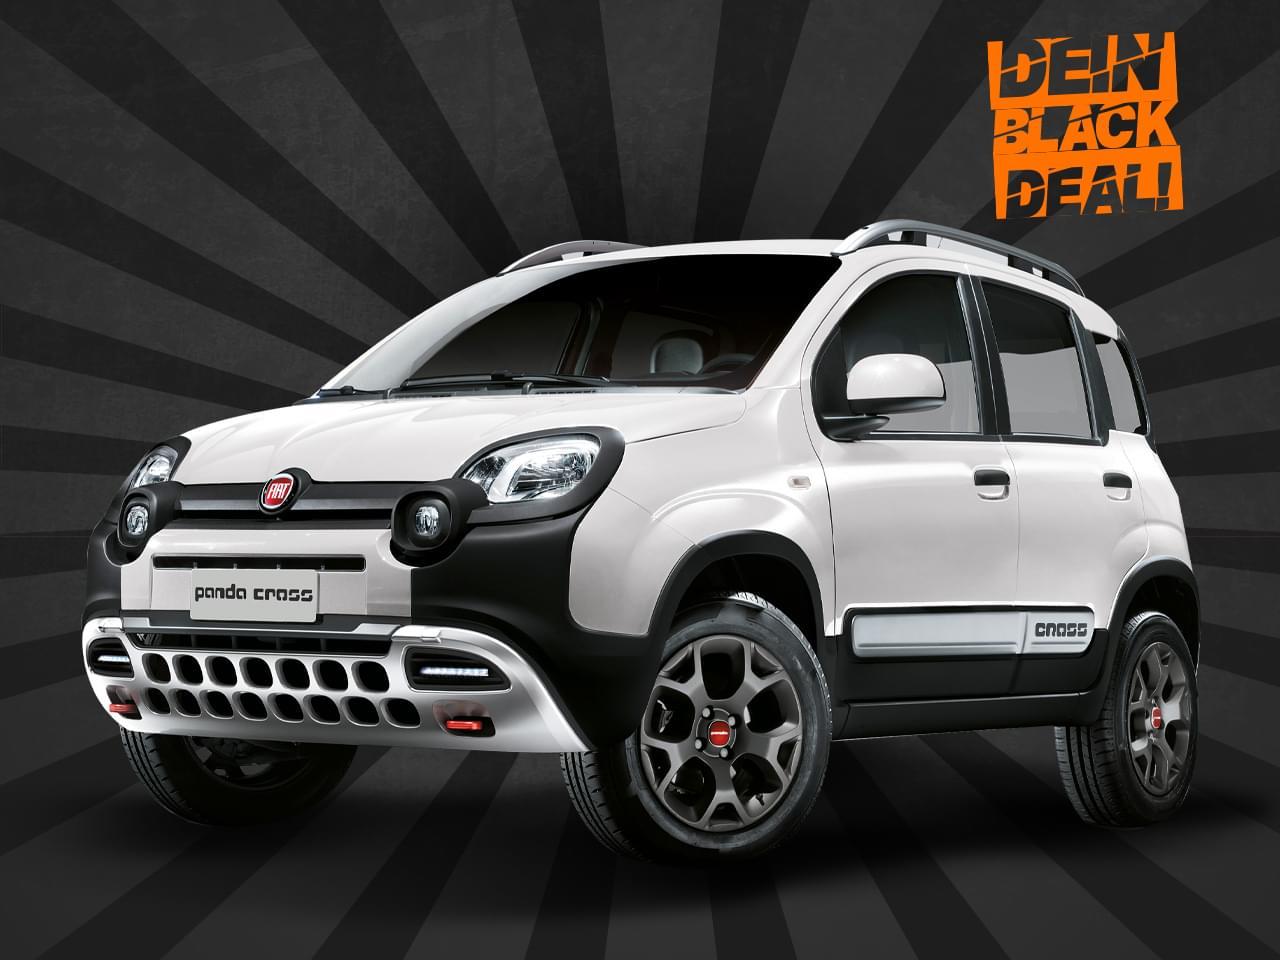 Fiat Panda City Cross More 1.2 8V